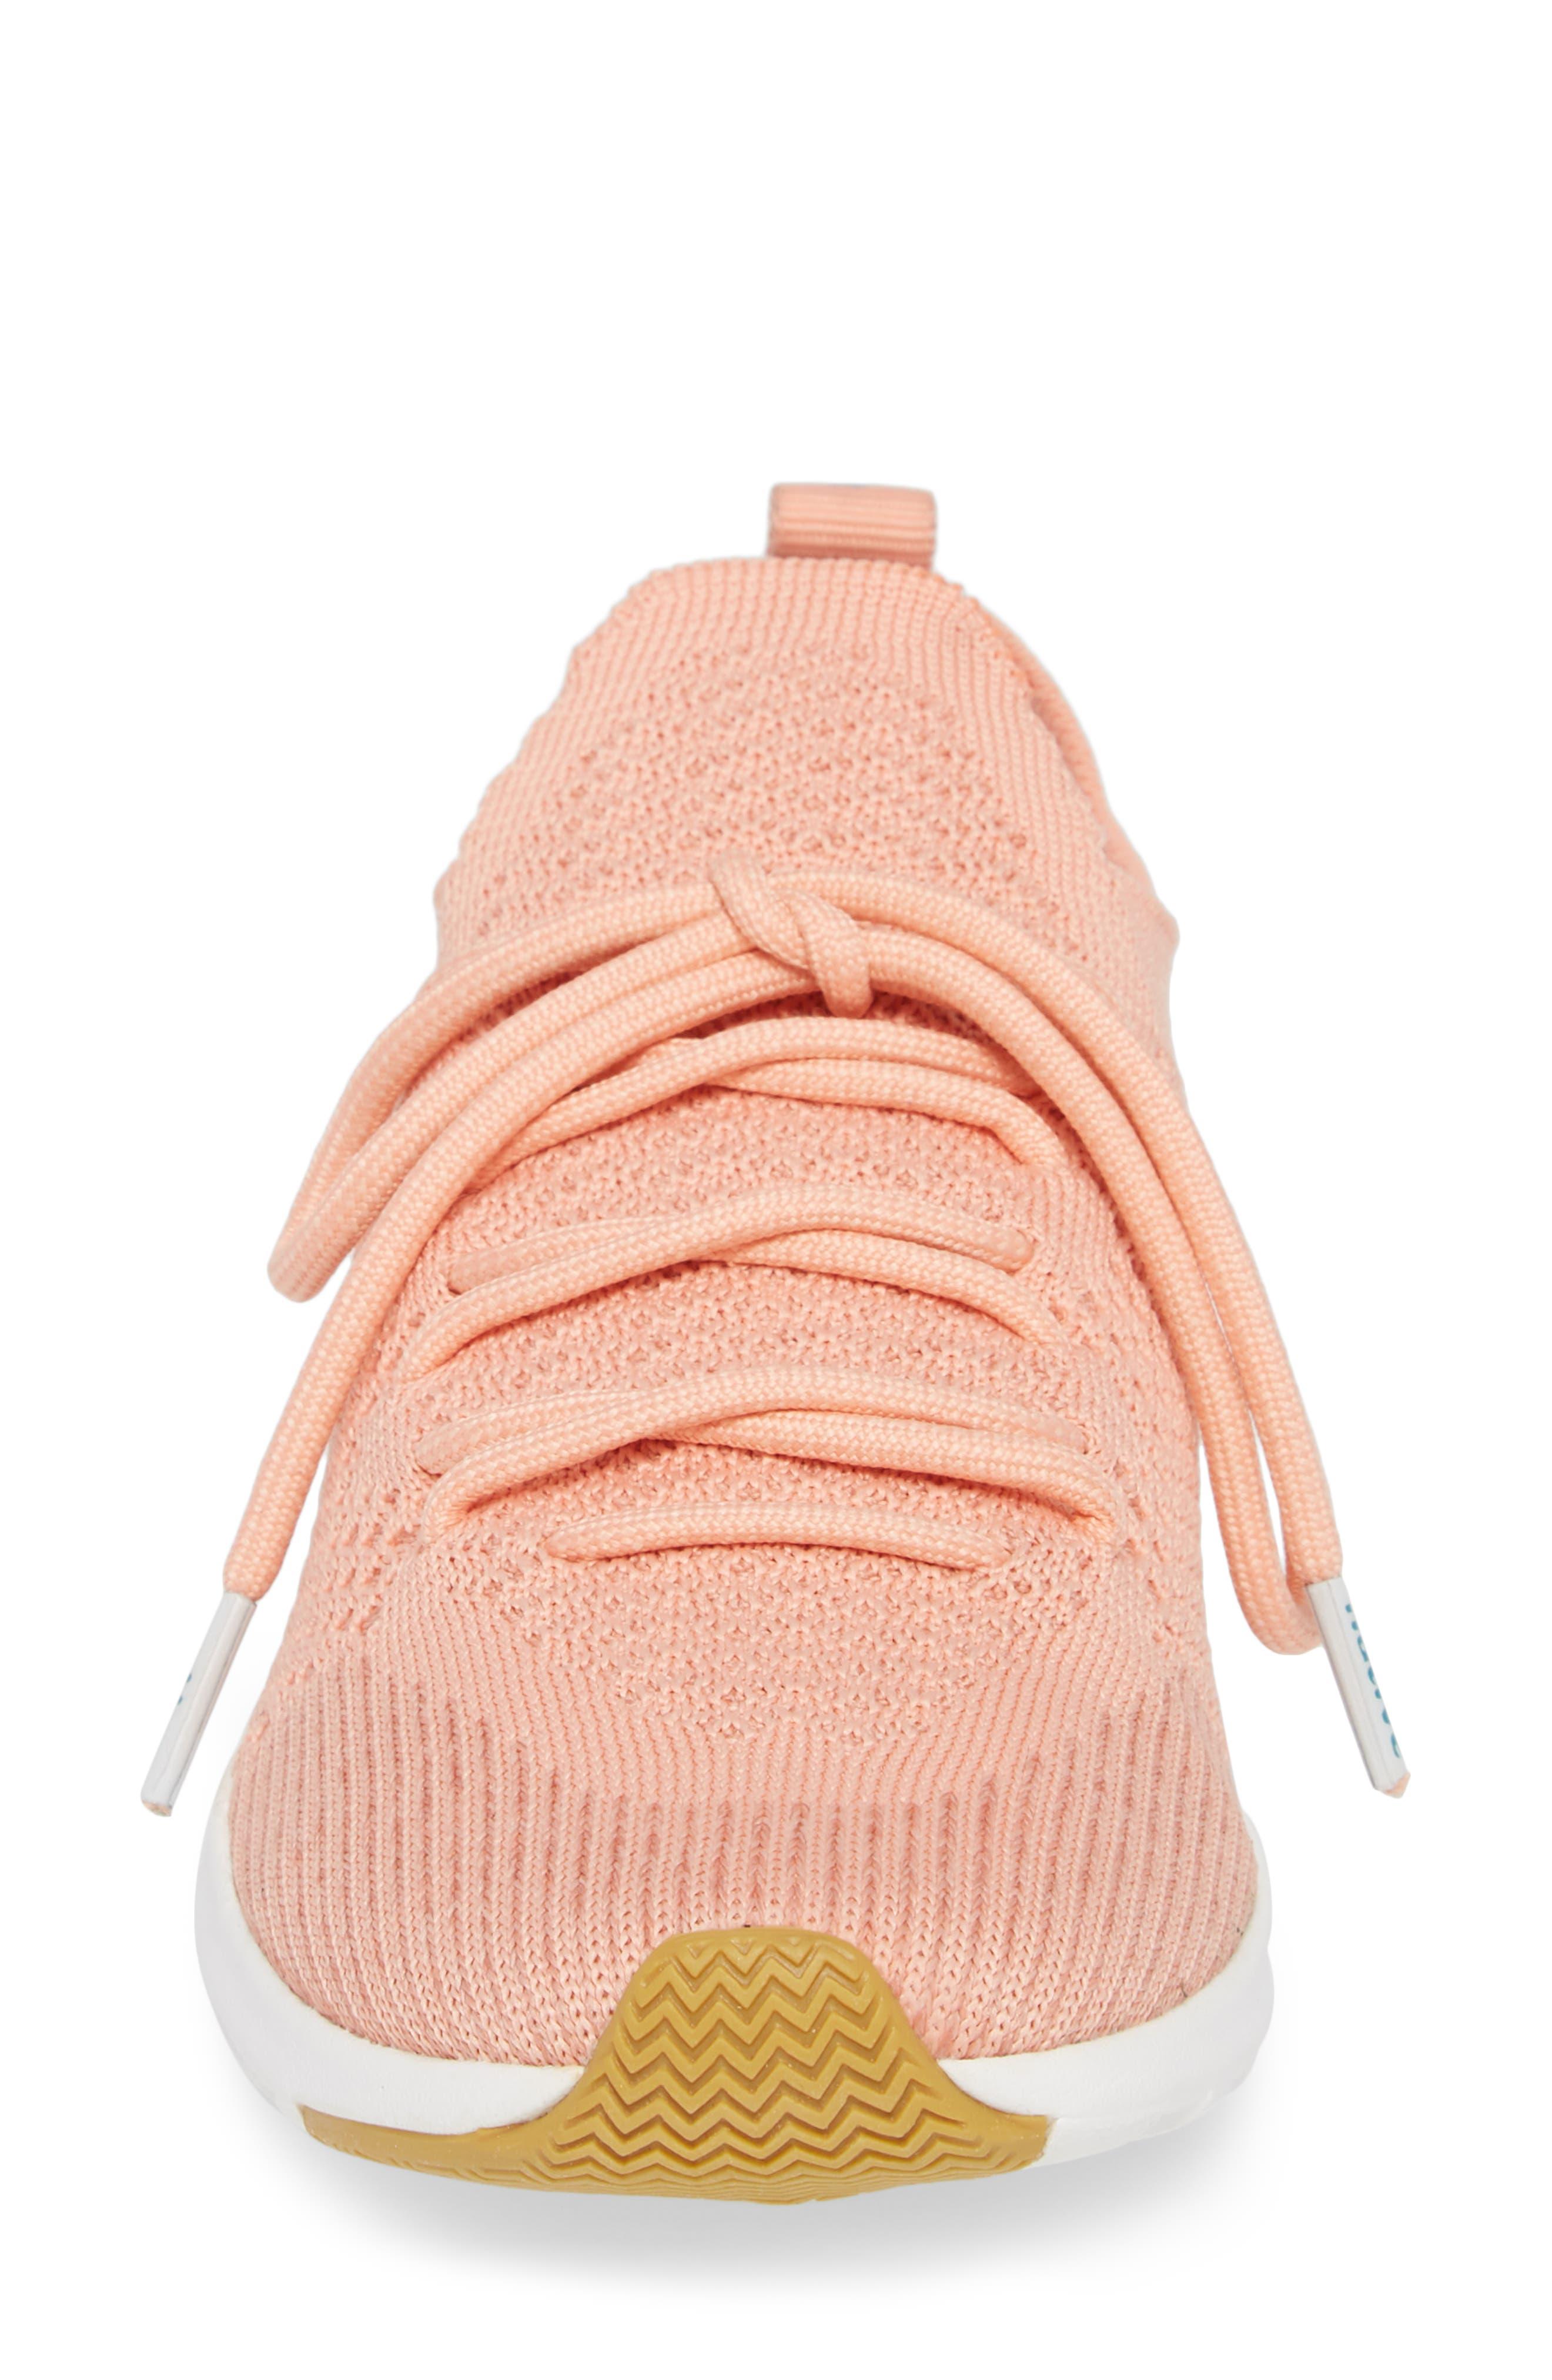 AP Mercury Liteknit Sneaker,                             Alternate thumbnail 4, color,                             Clay Pink/ Shell White